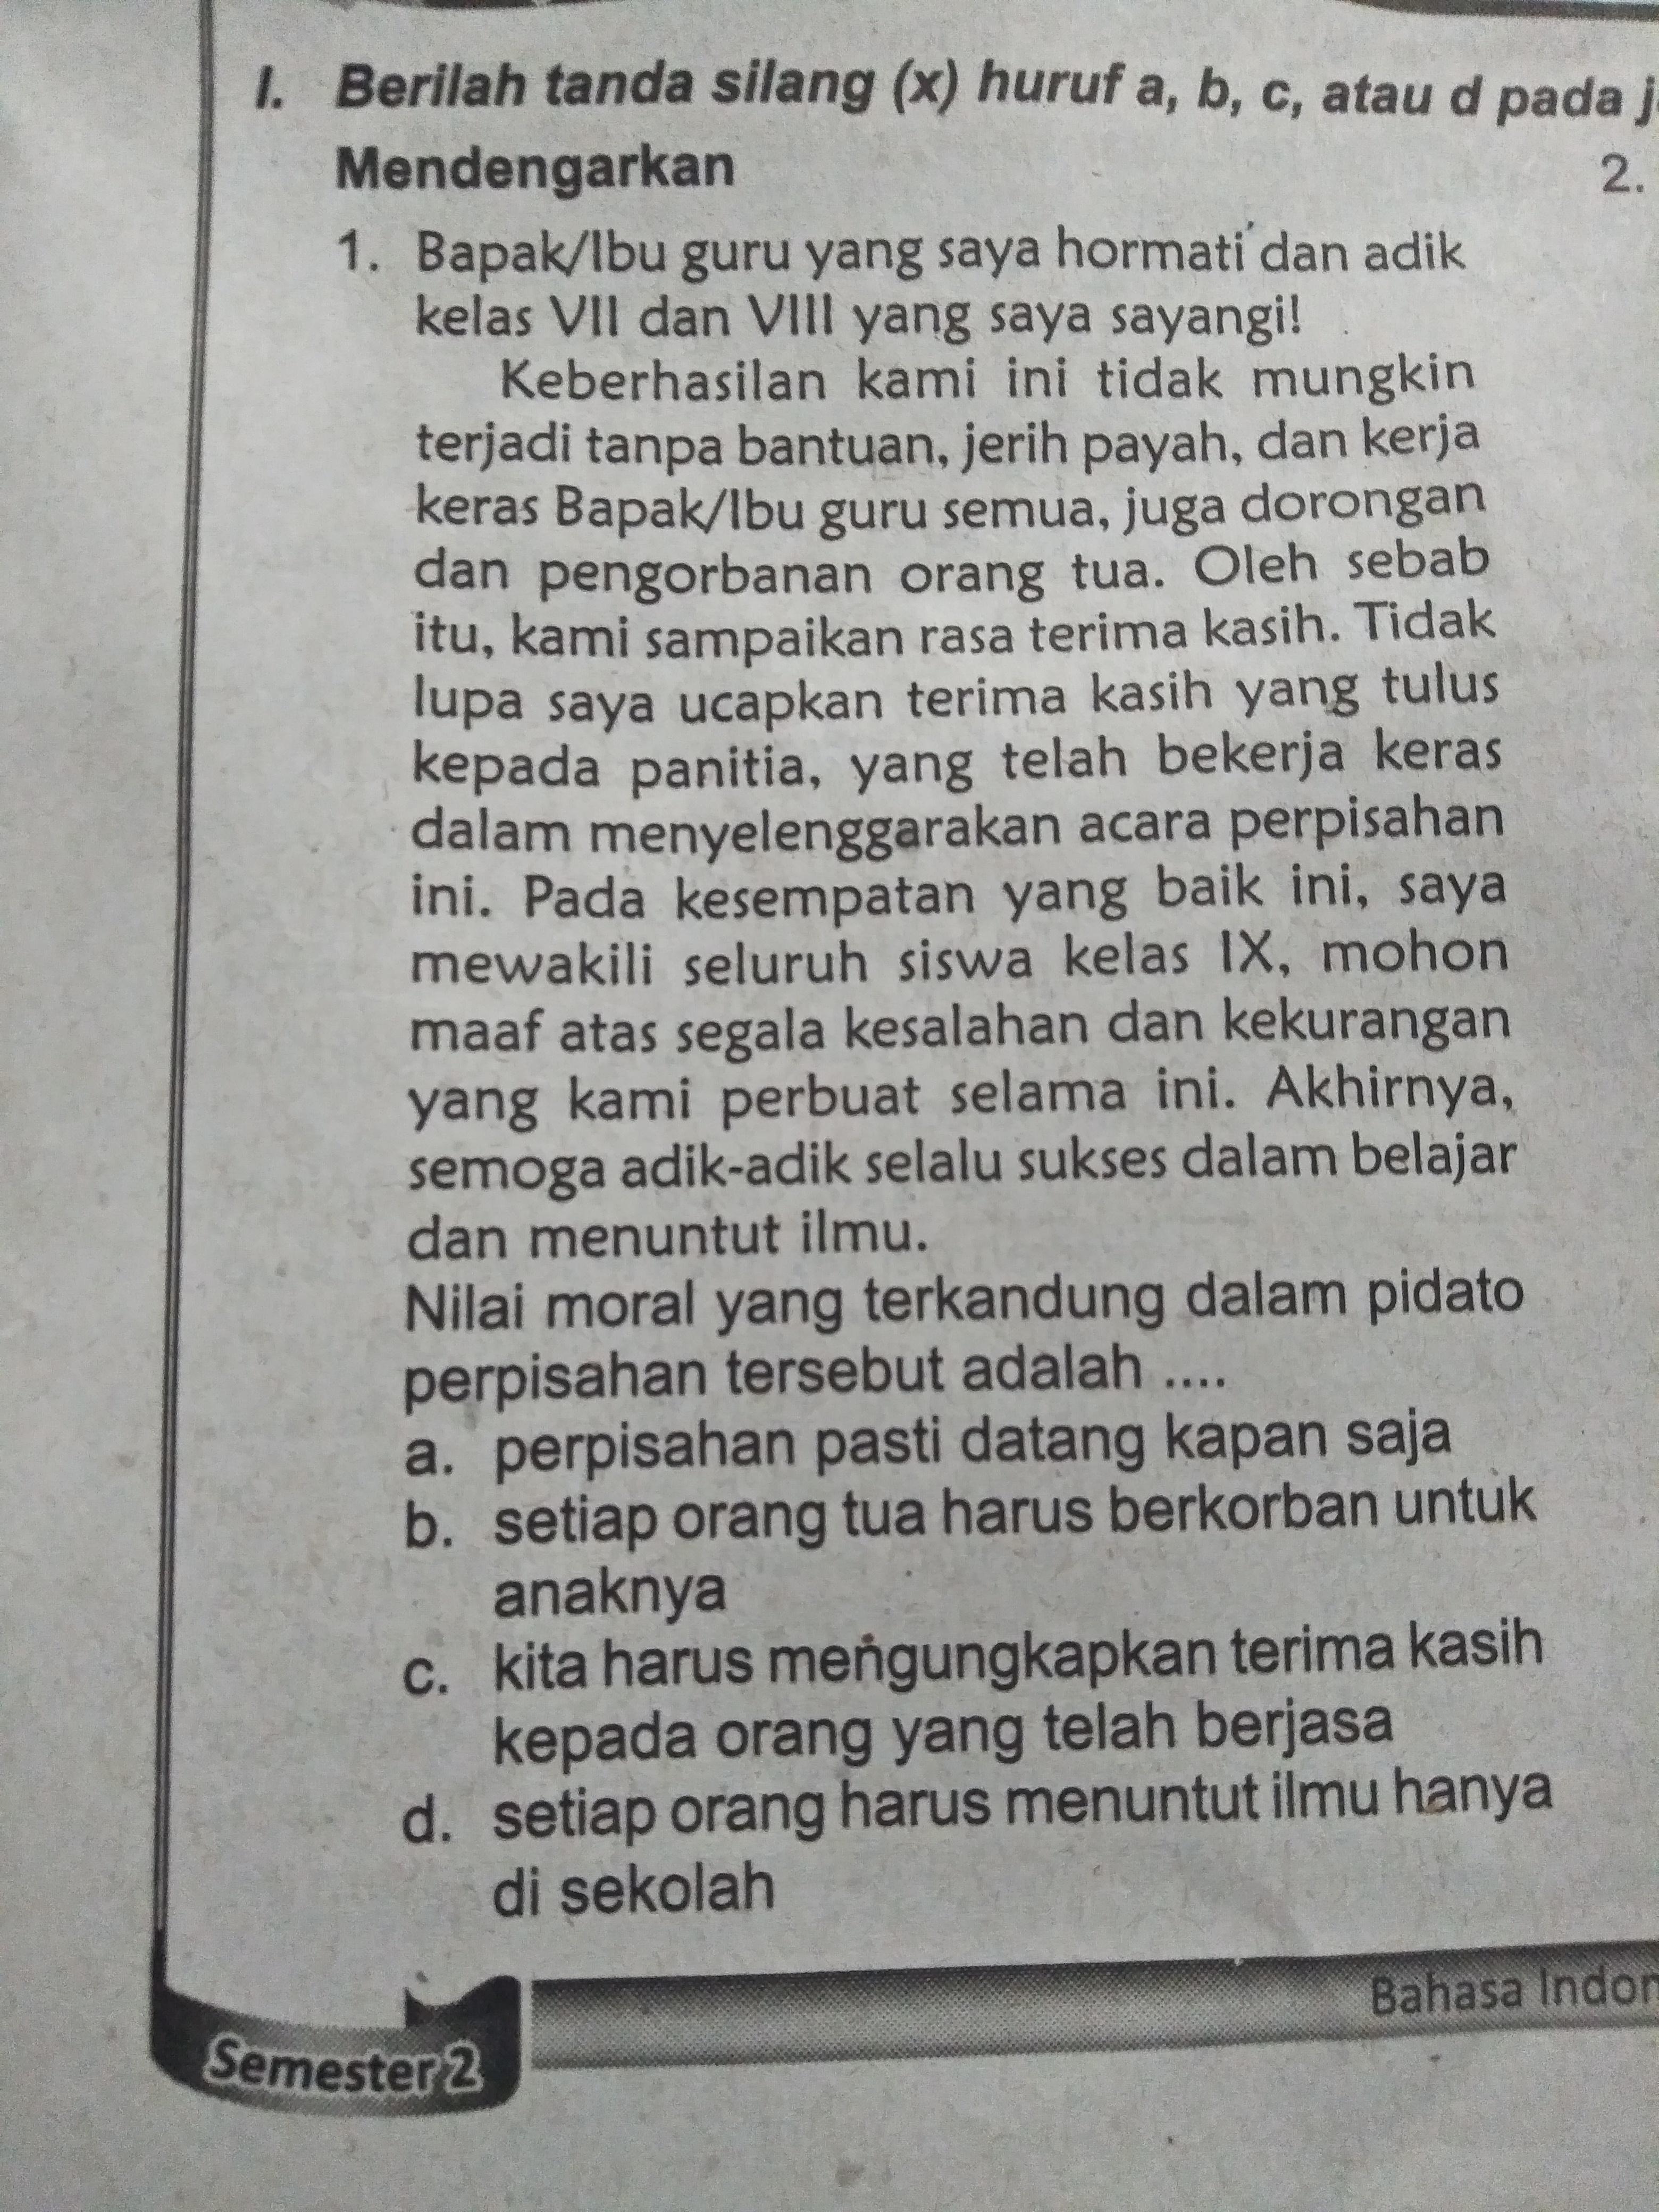 Tolong Bantu Jawab Yaah Brainly Co Id